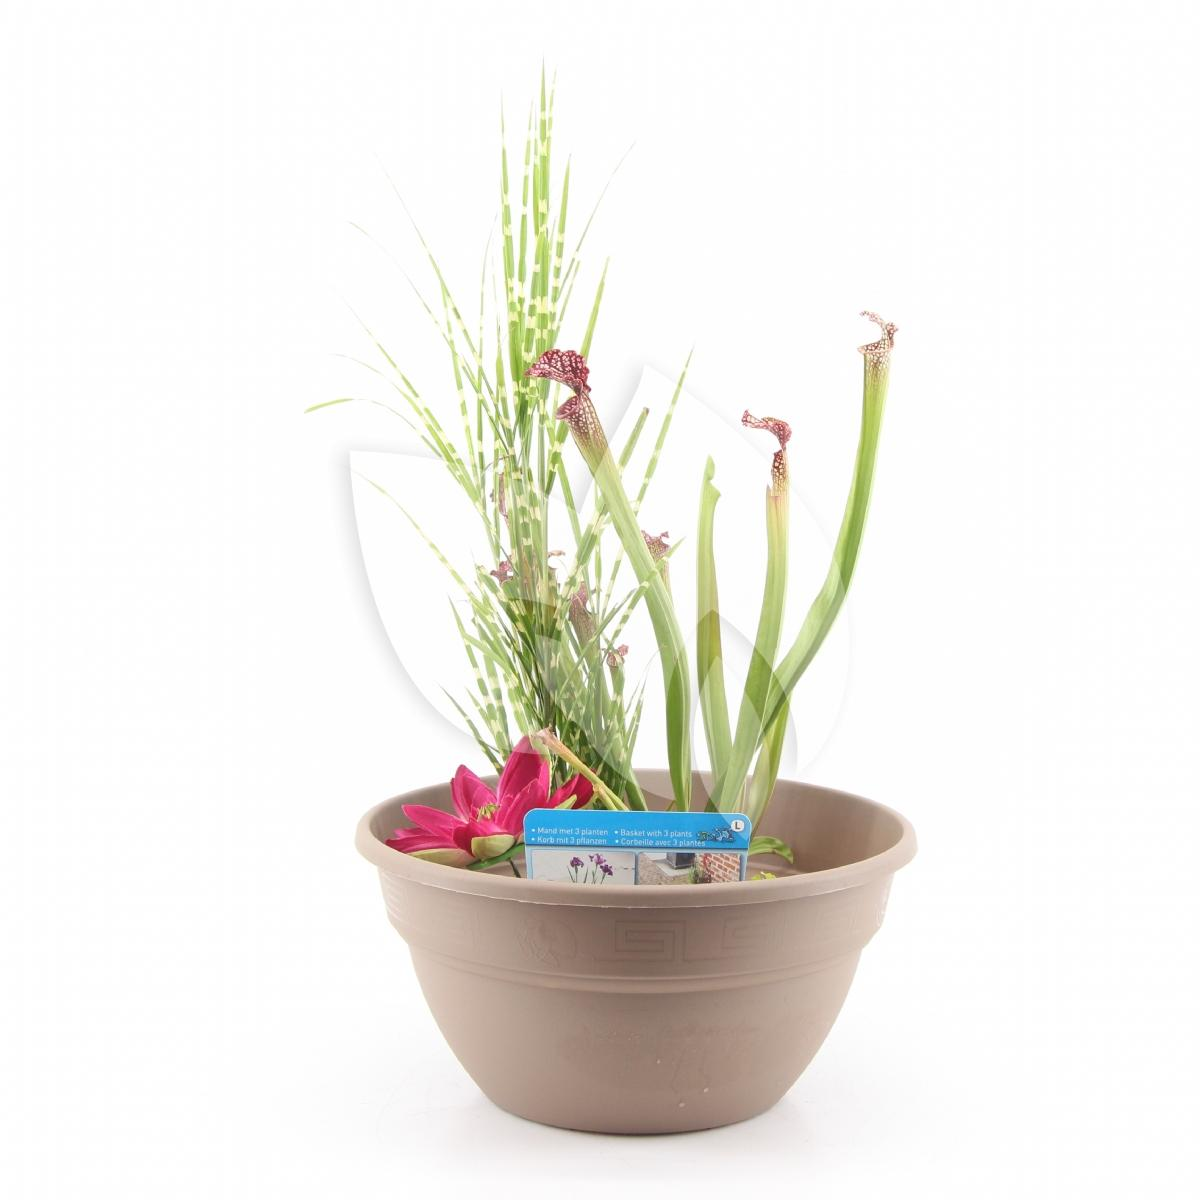 Moerings waterplanten mini vijver kunststof taupe for Kunststof vijvers